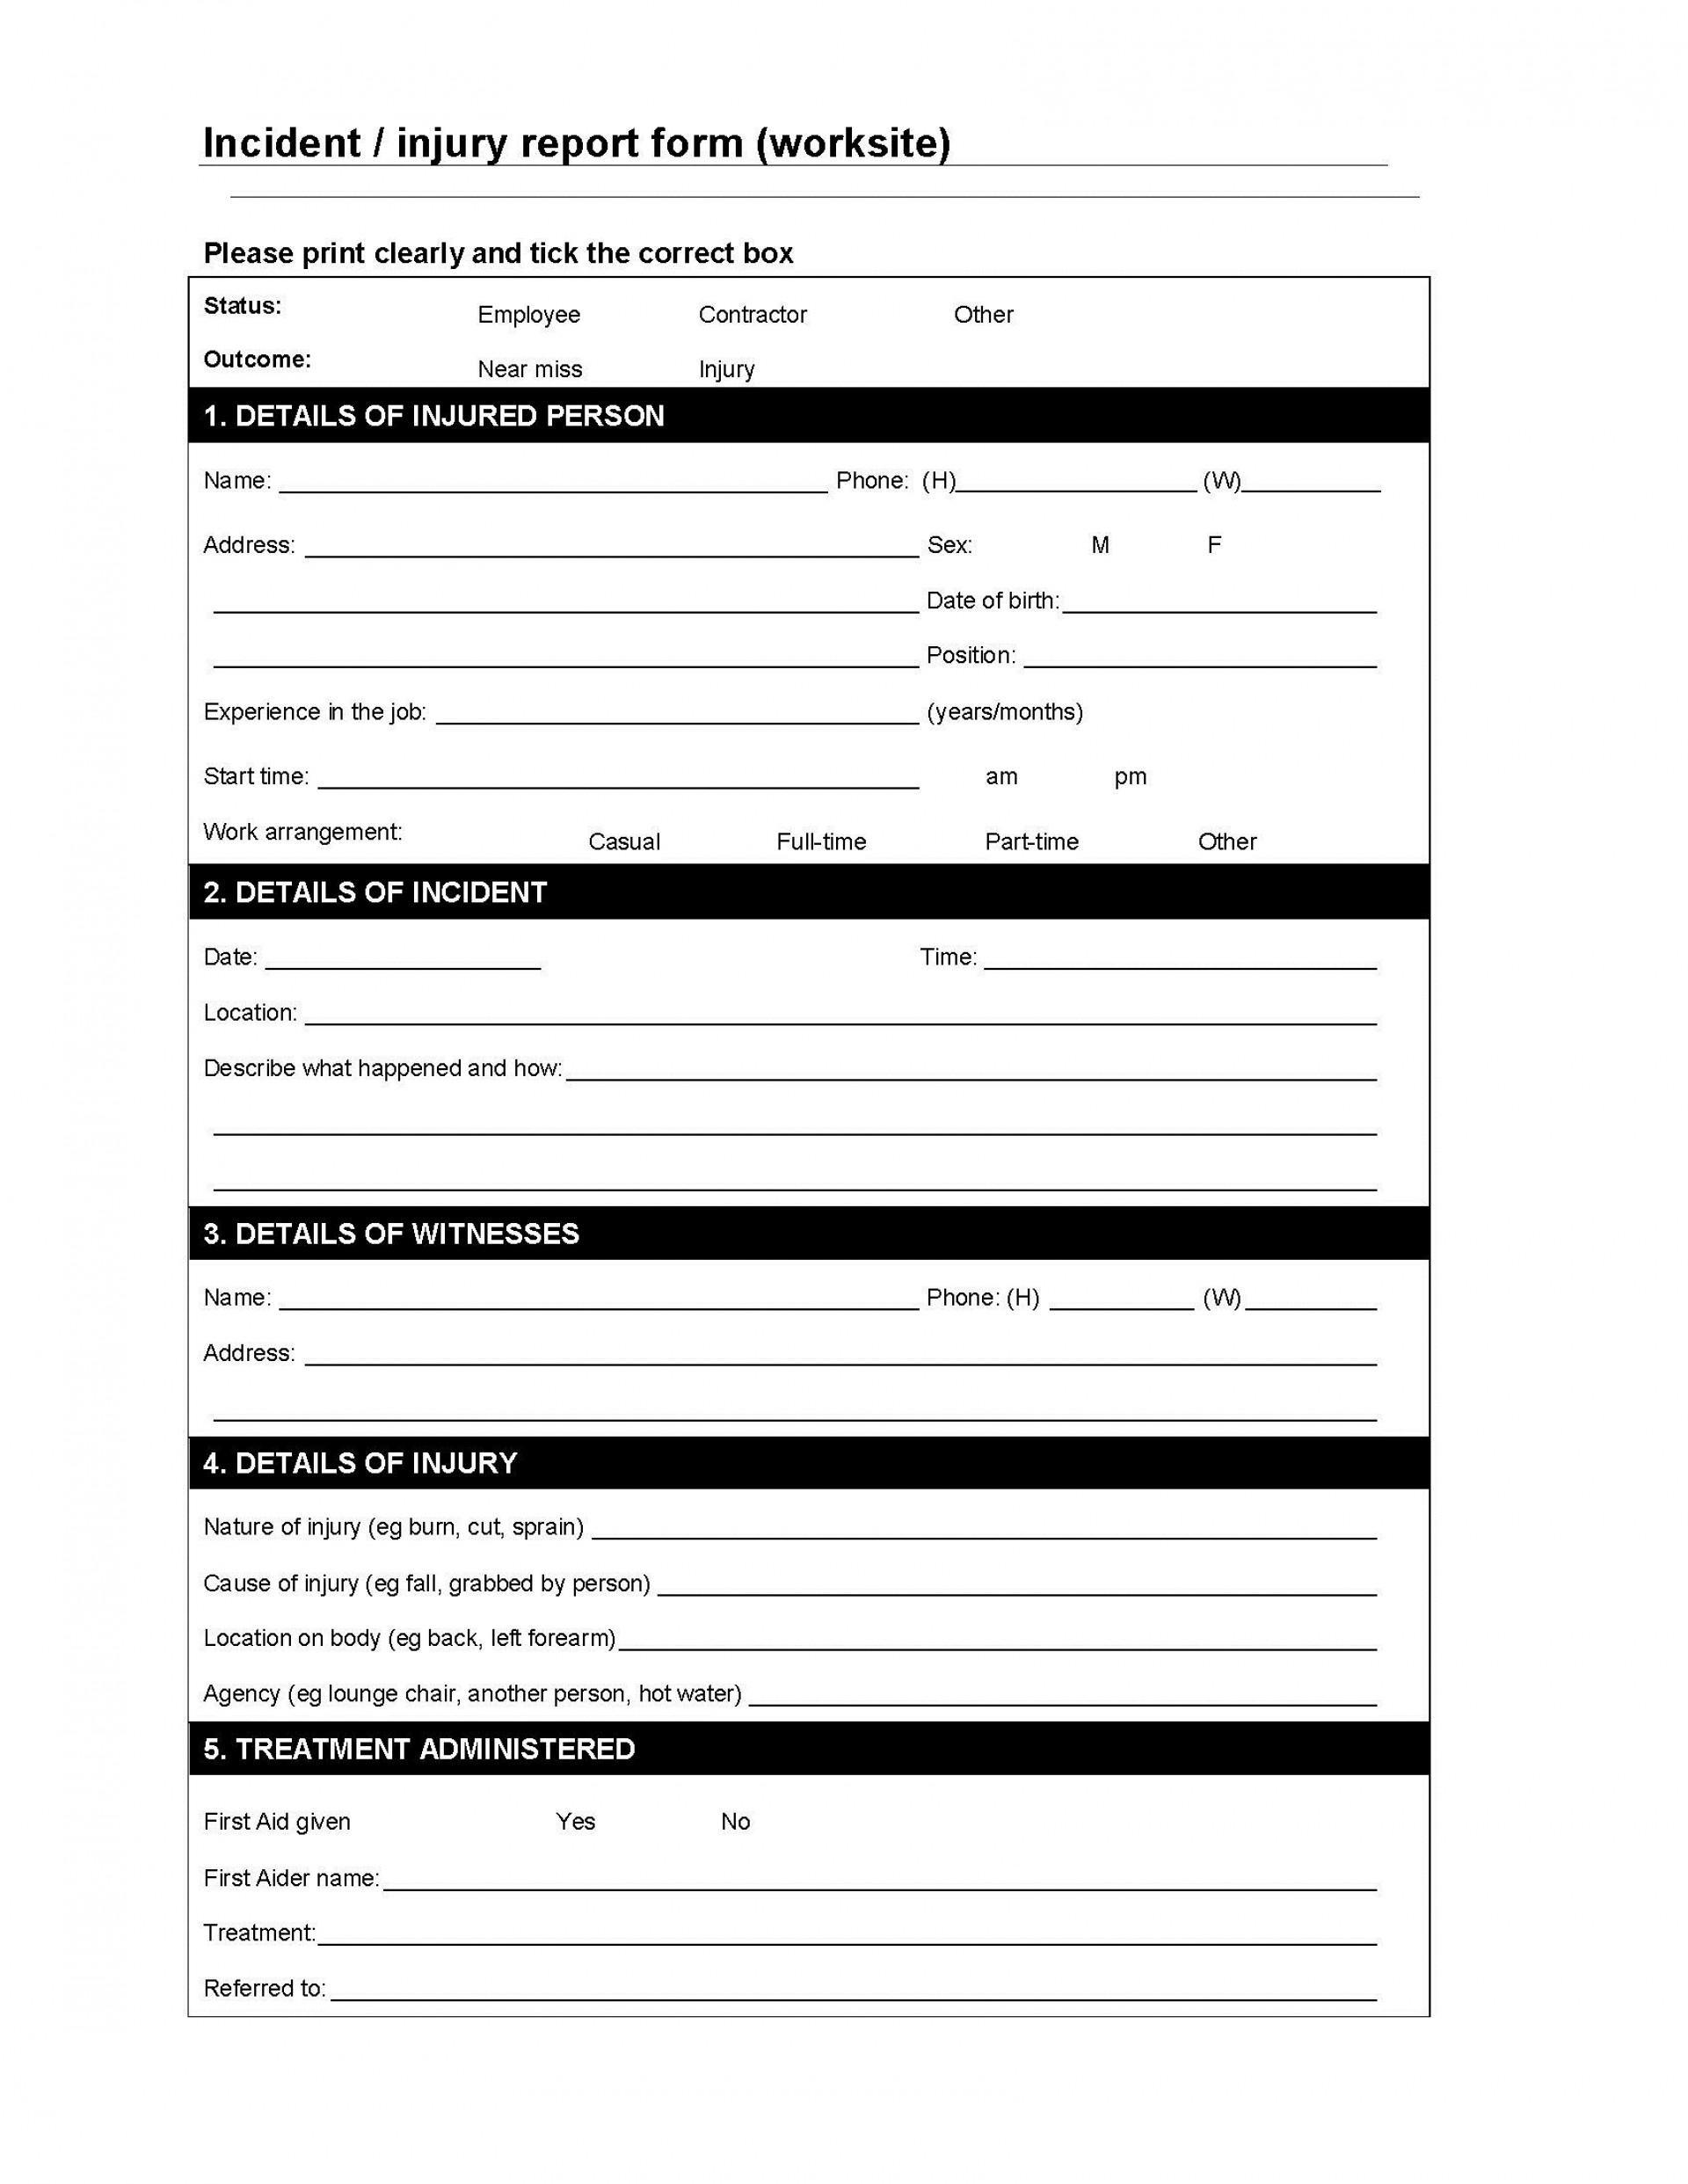 004 Surprising Workplace Incident Report Template Ontario Idea  Form1920